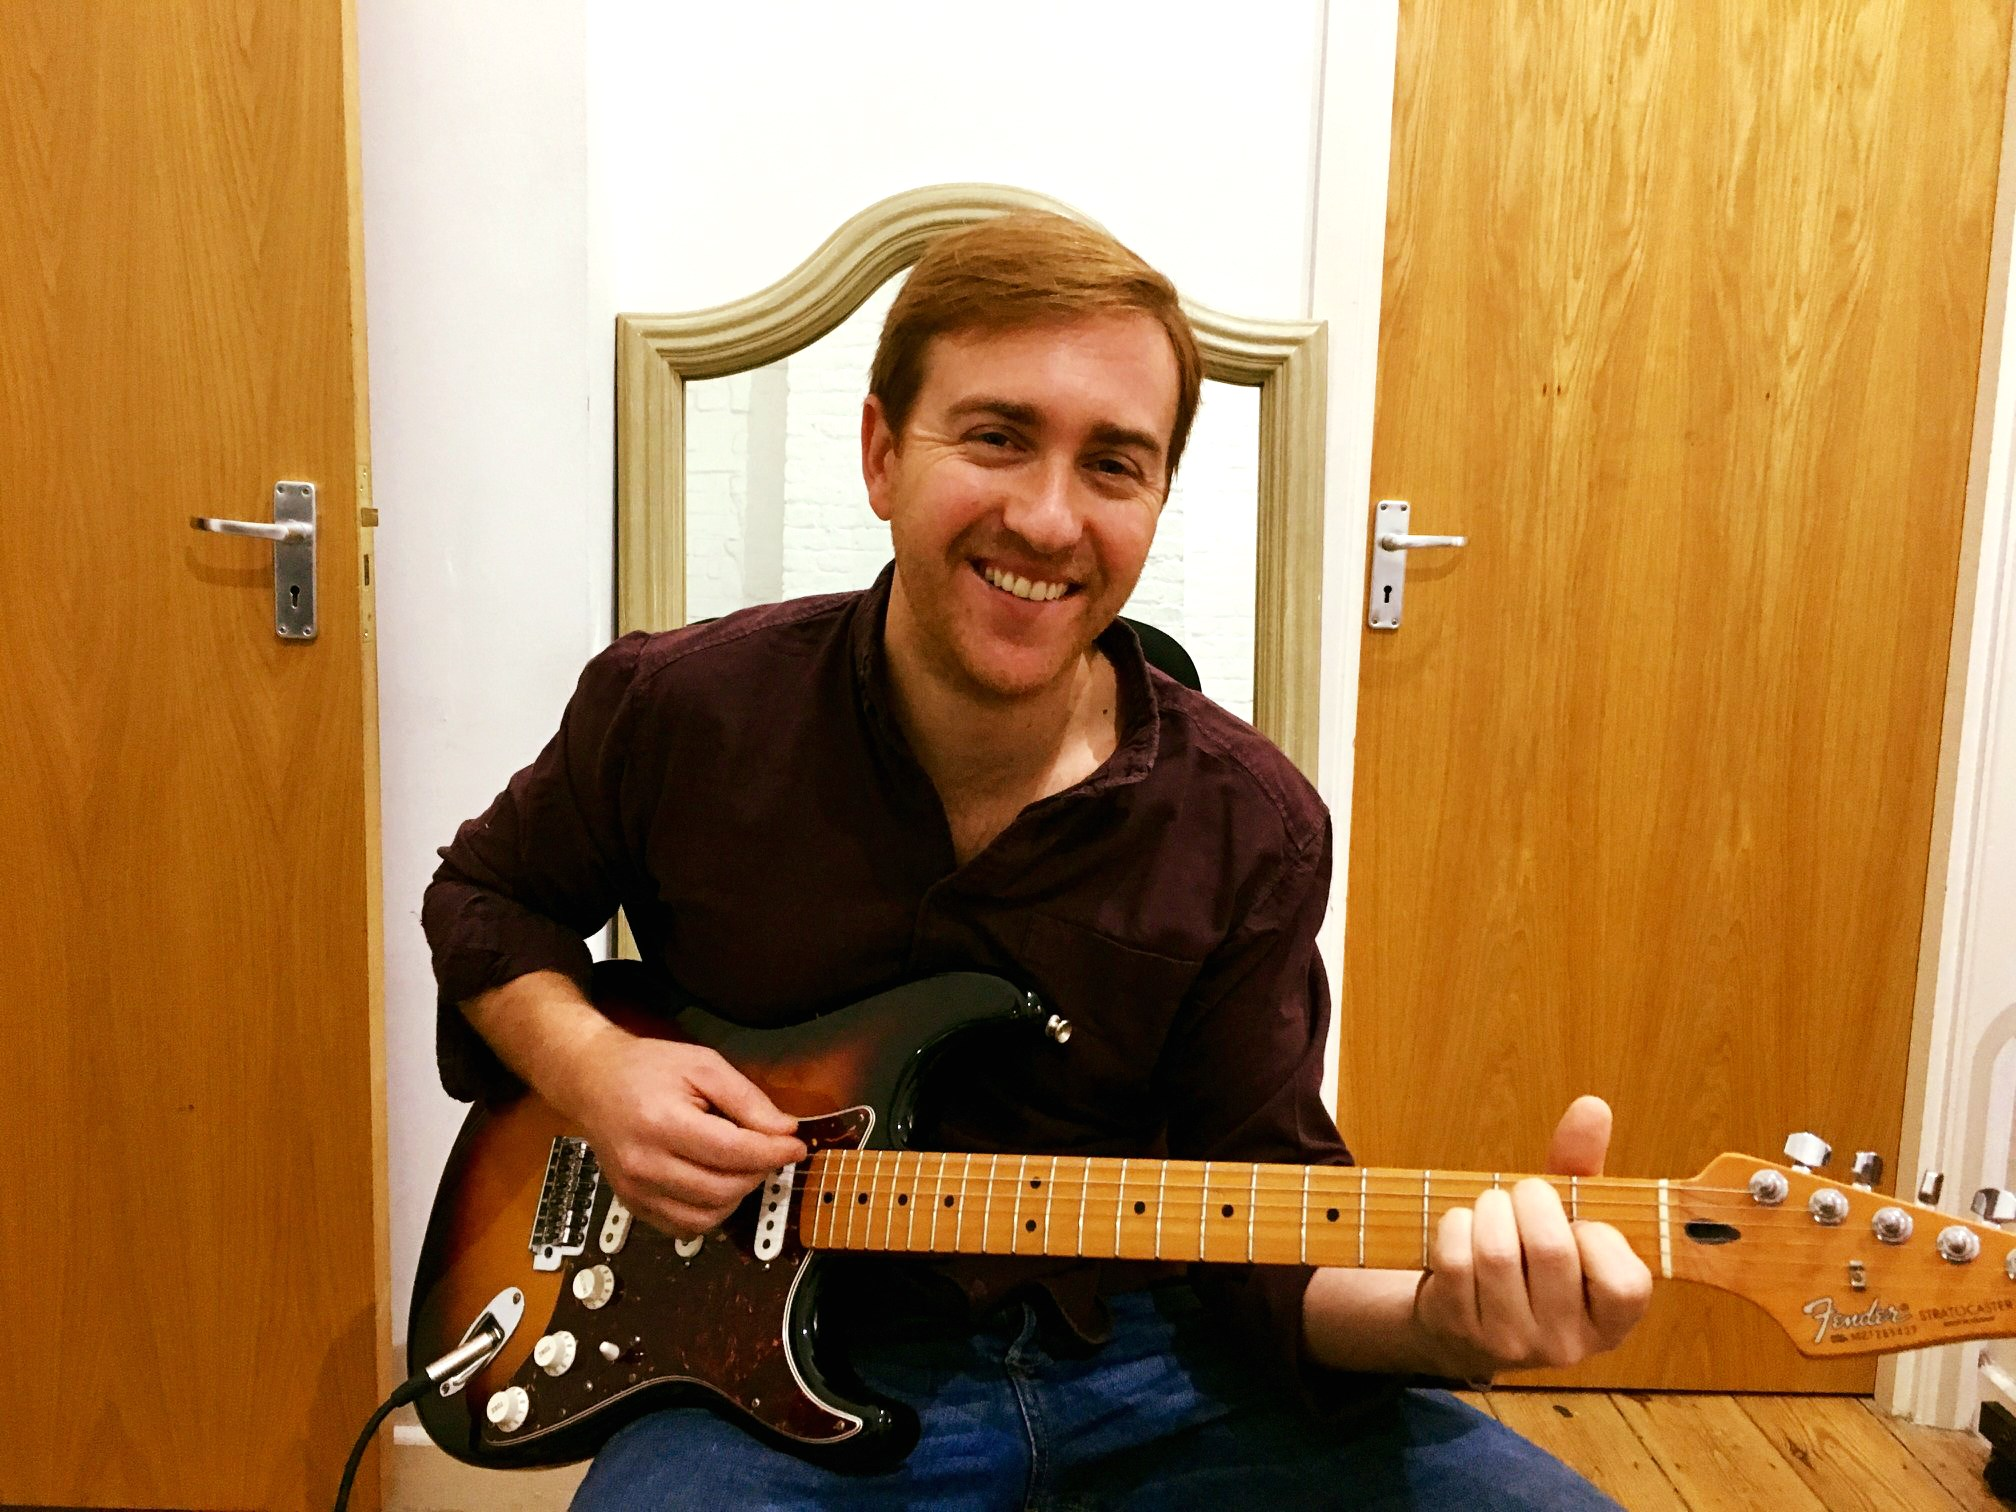 What makes a great guitar teacher